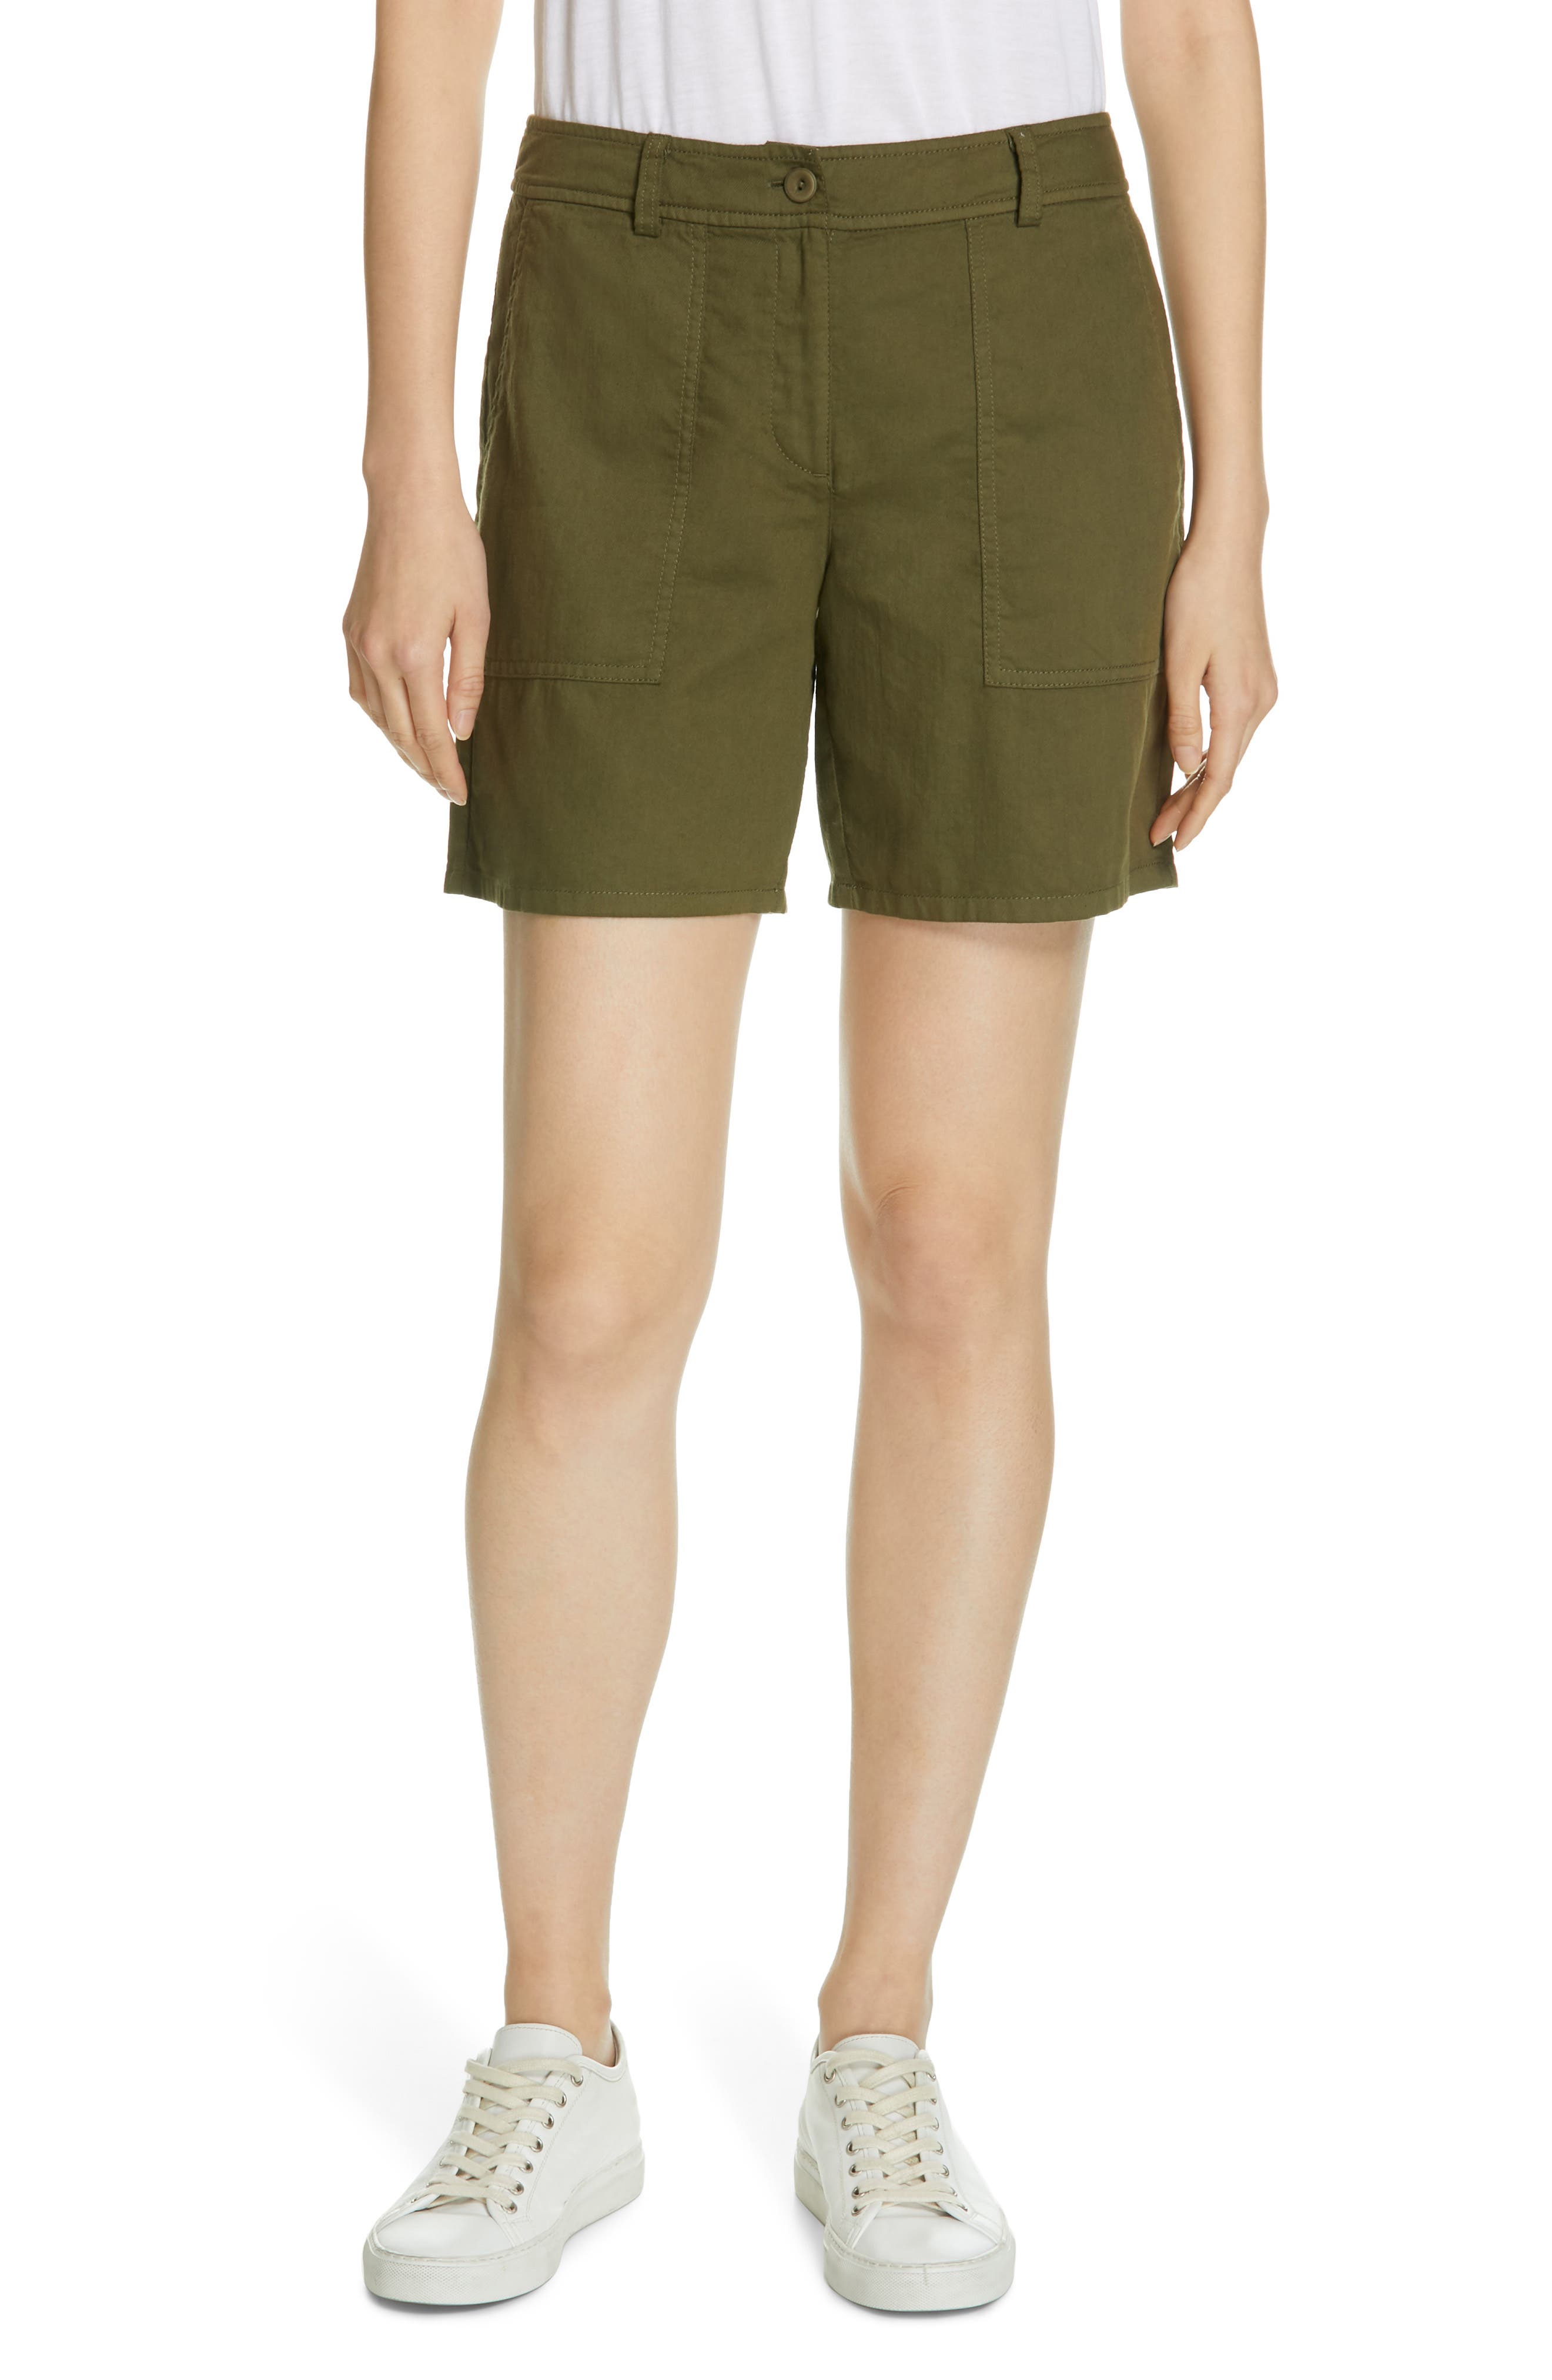 Petite Eileen Fisher Organic Cotton Walking Shorts, Ivory